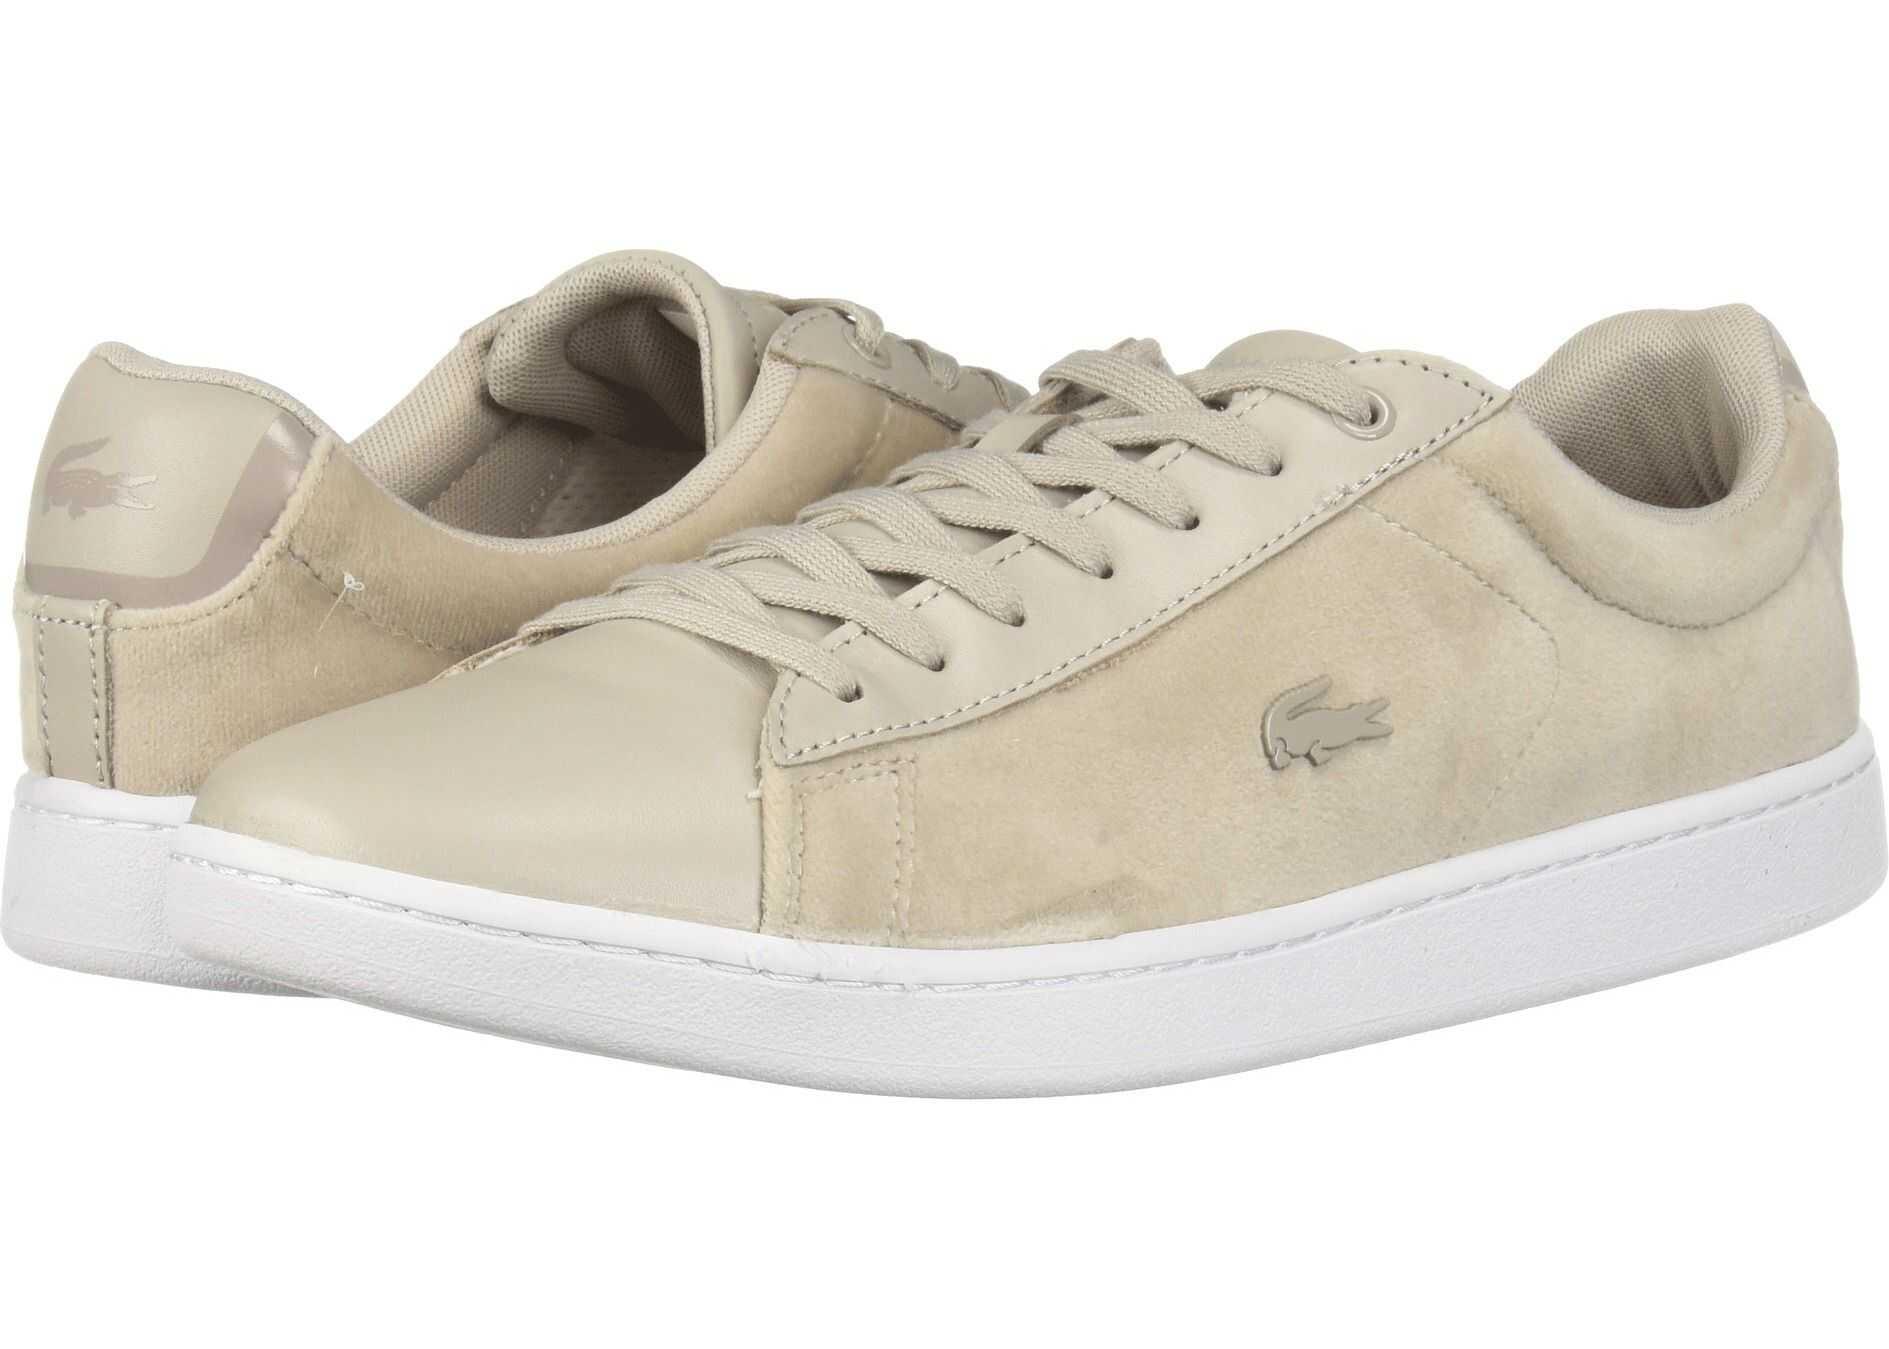 Lacoste Carnaby Evo 318 8 Grey/White